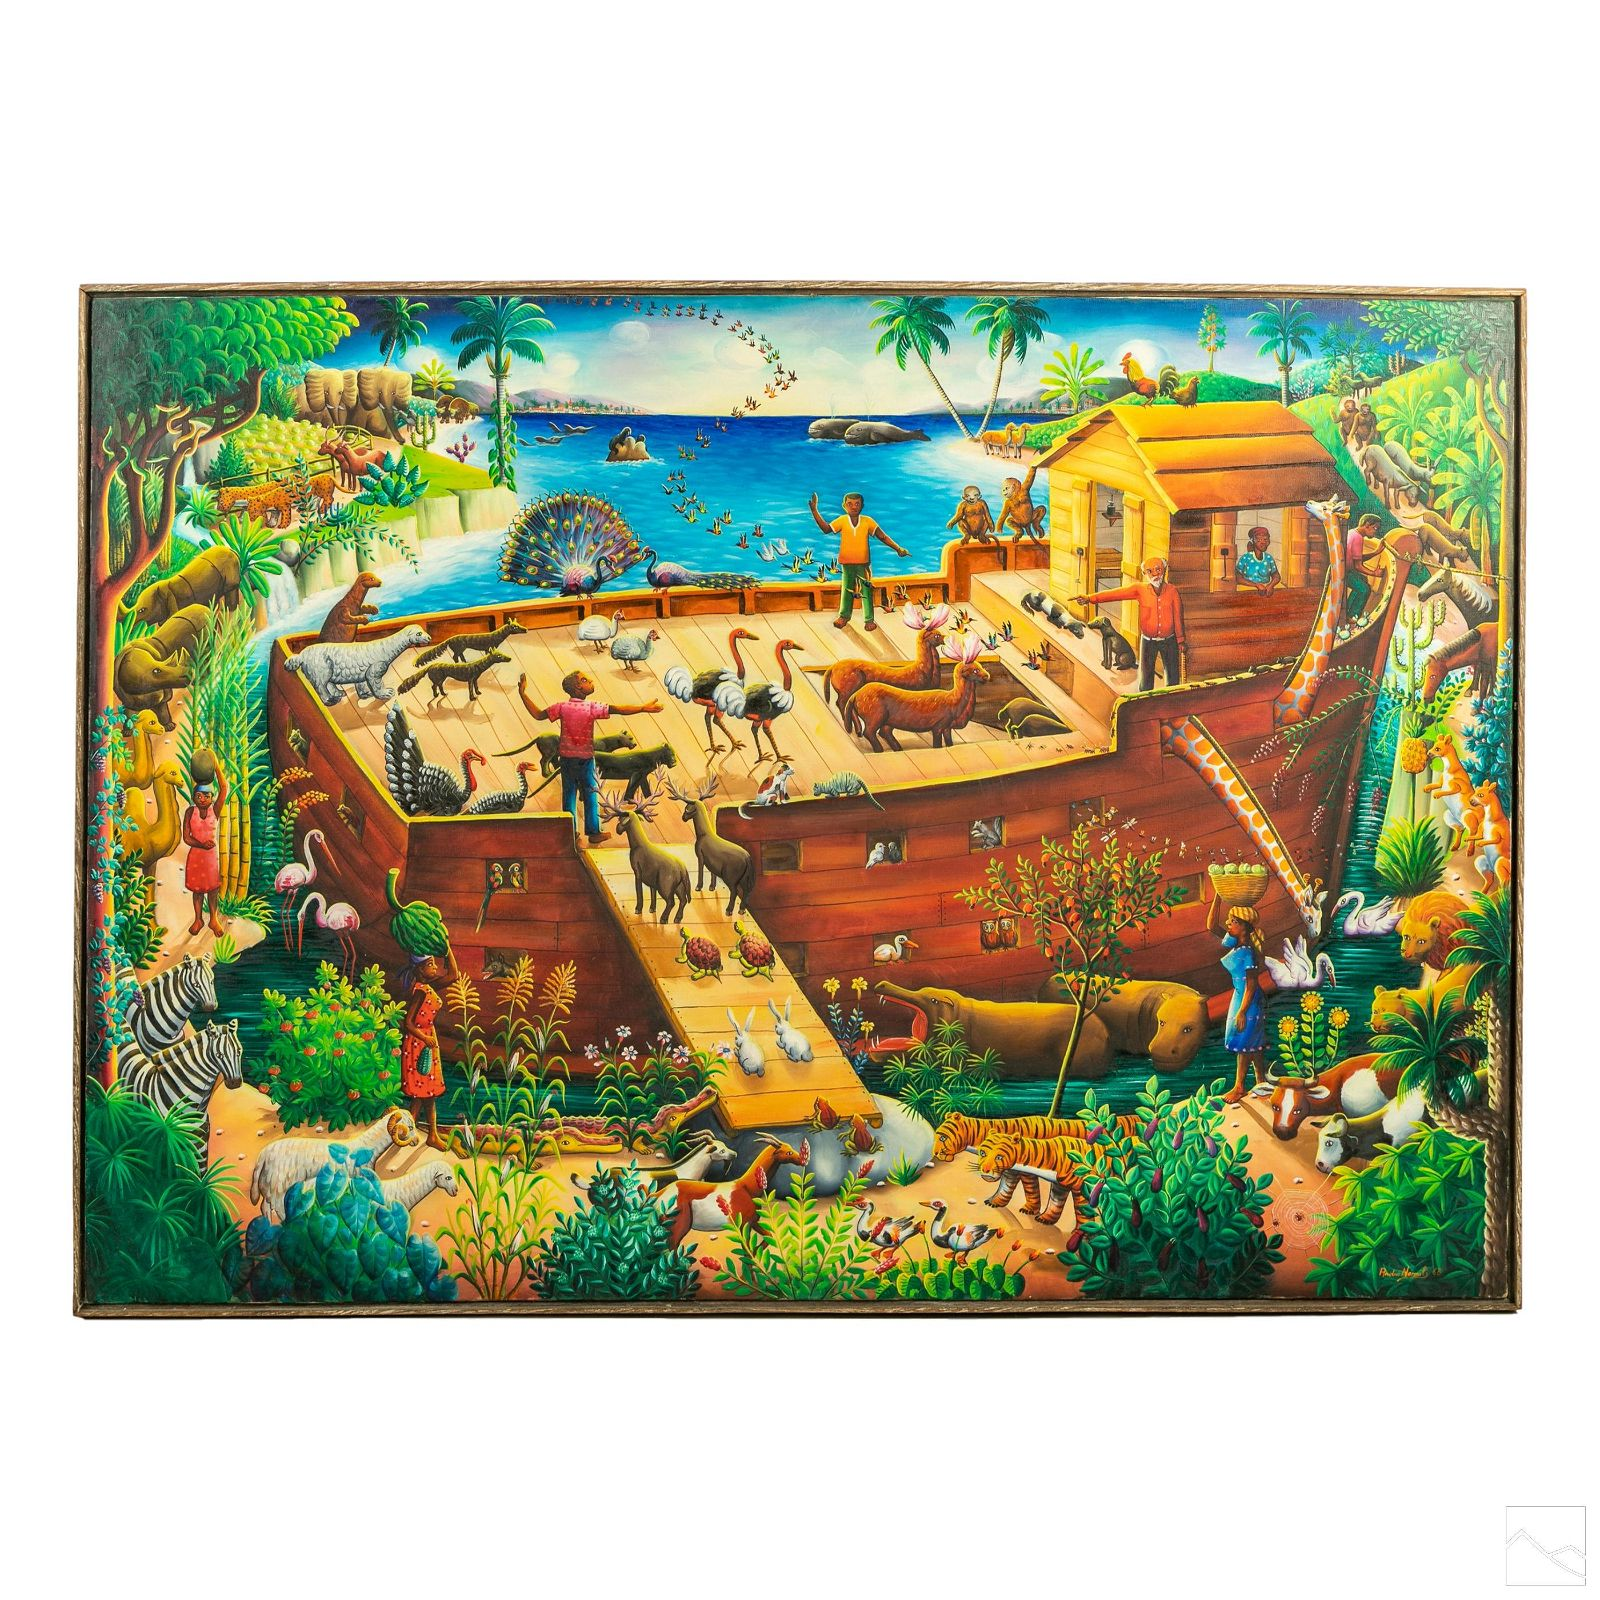 Andre Normil (1934-2014) Haitian Folk Art Painting